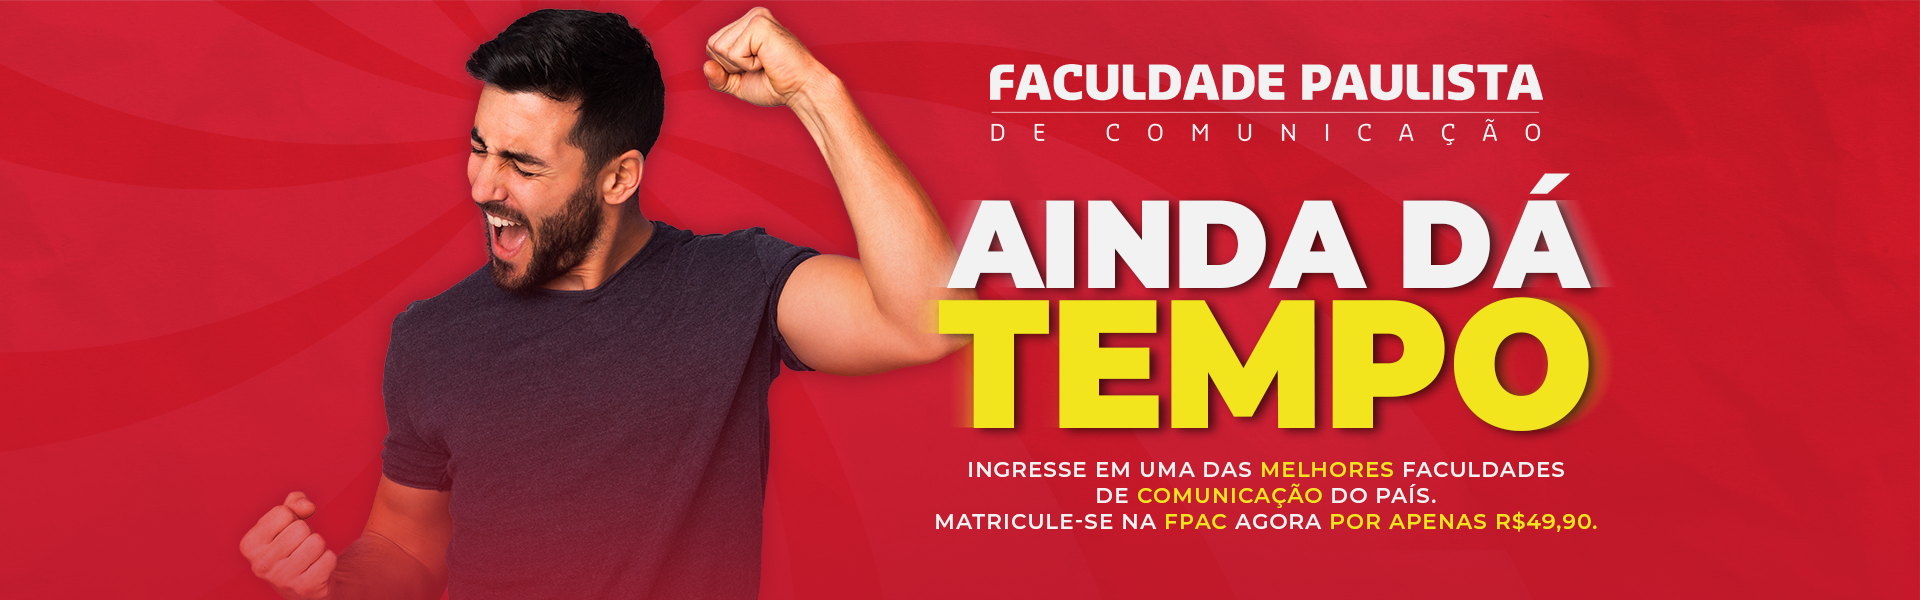 Banner-FPAC-AINDA DA TEMPO